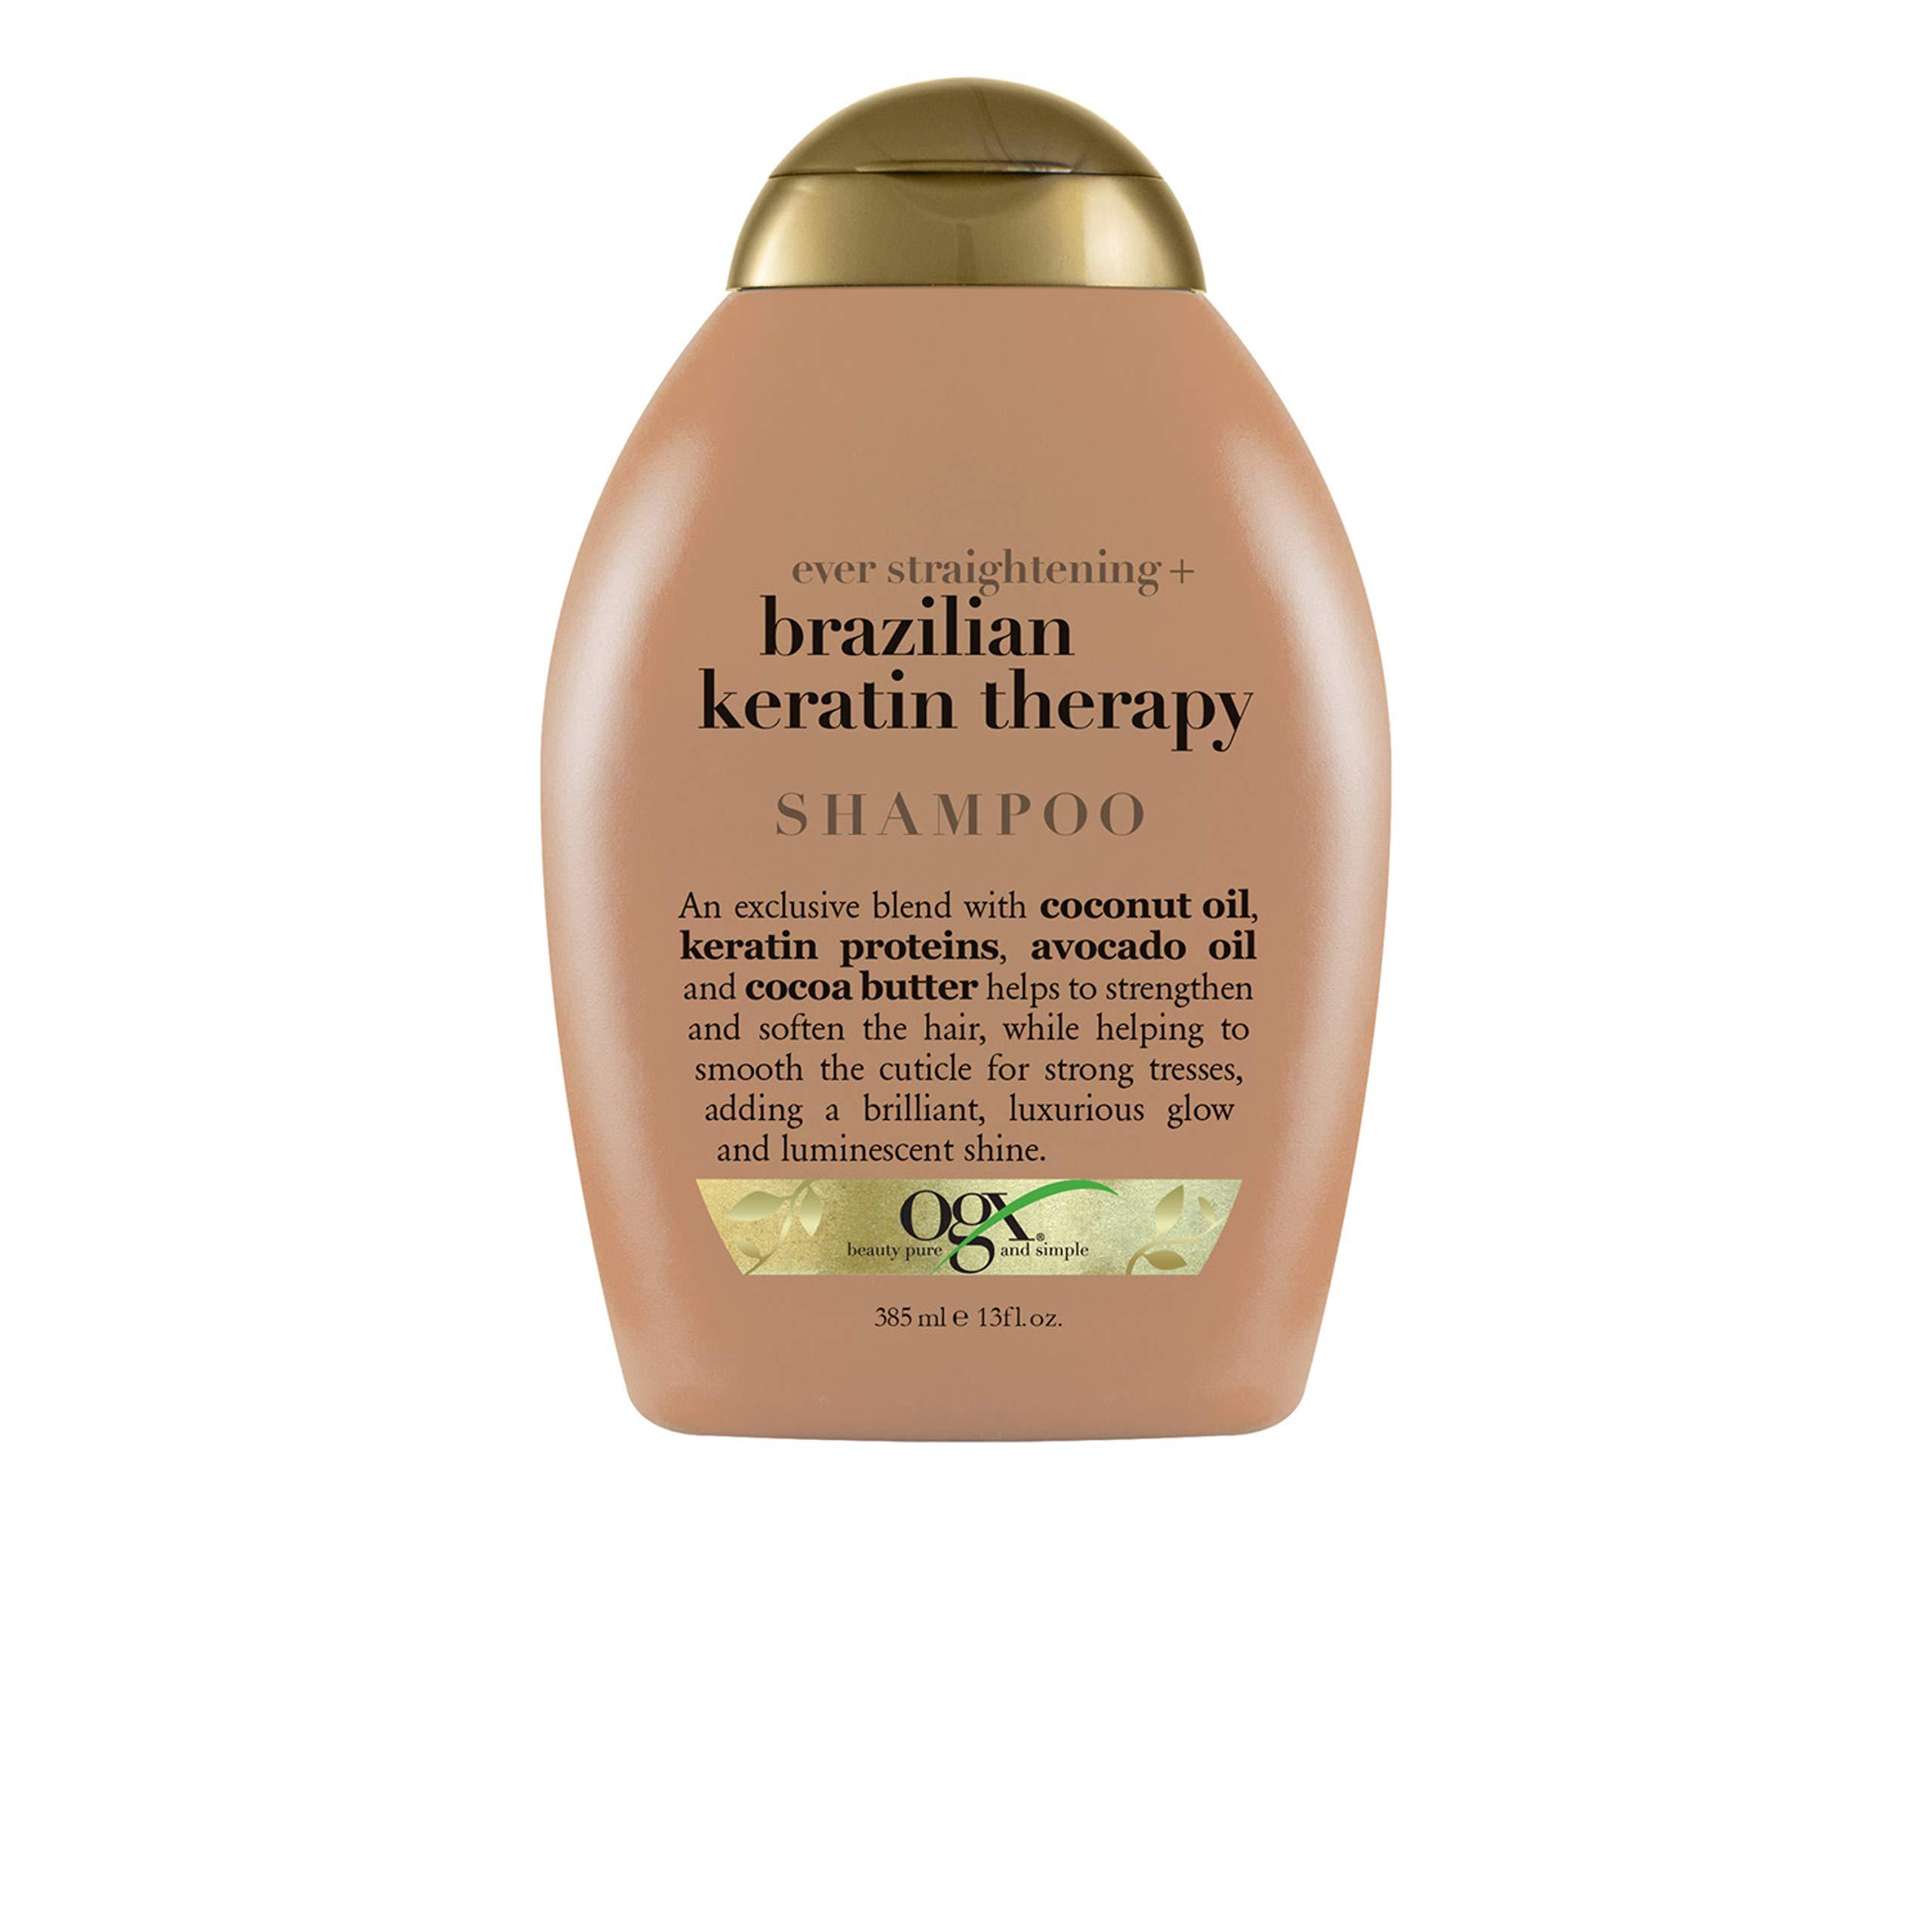 organix Ever Straightening Brazilian Keratin Therapy Shampoo, 13 Oz